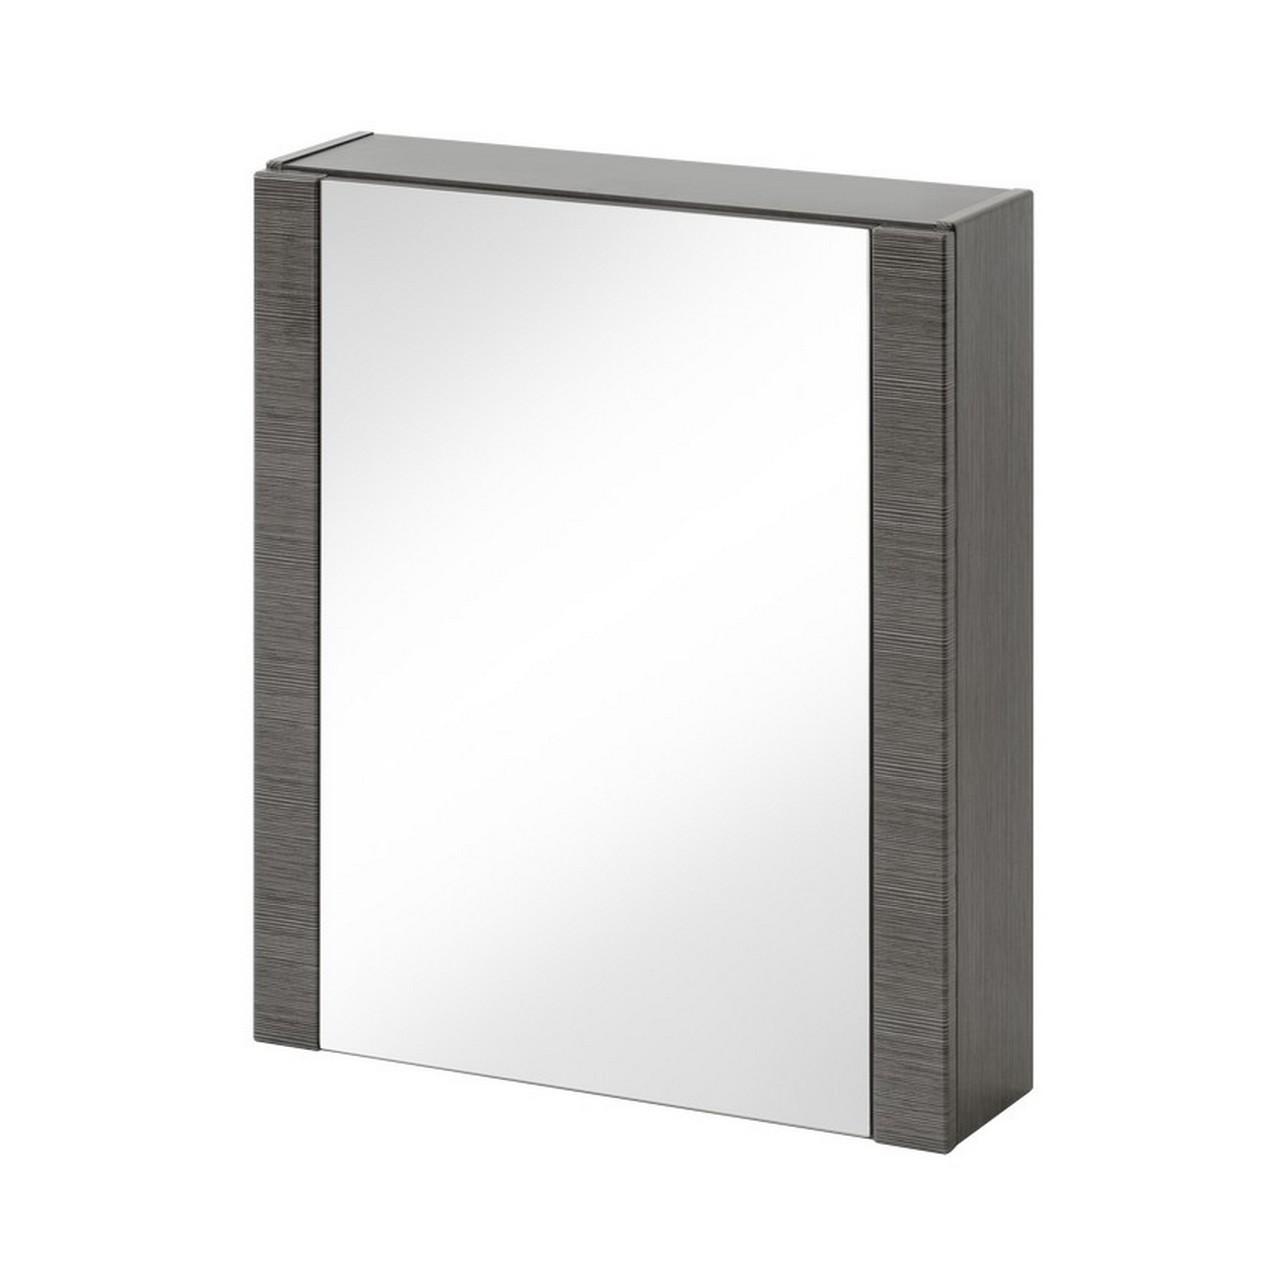 Dulap baie suspendat cu 1 usa si oglinda, Viento, l60xA16xH69 cm imagine